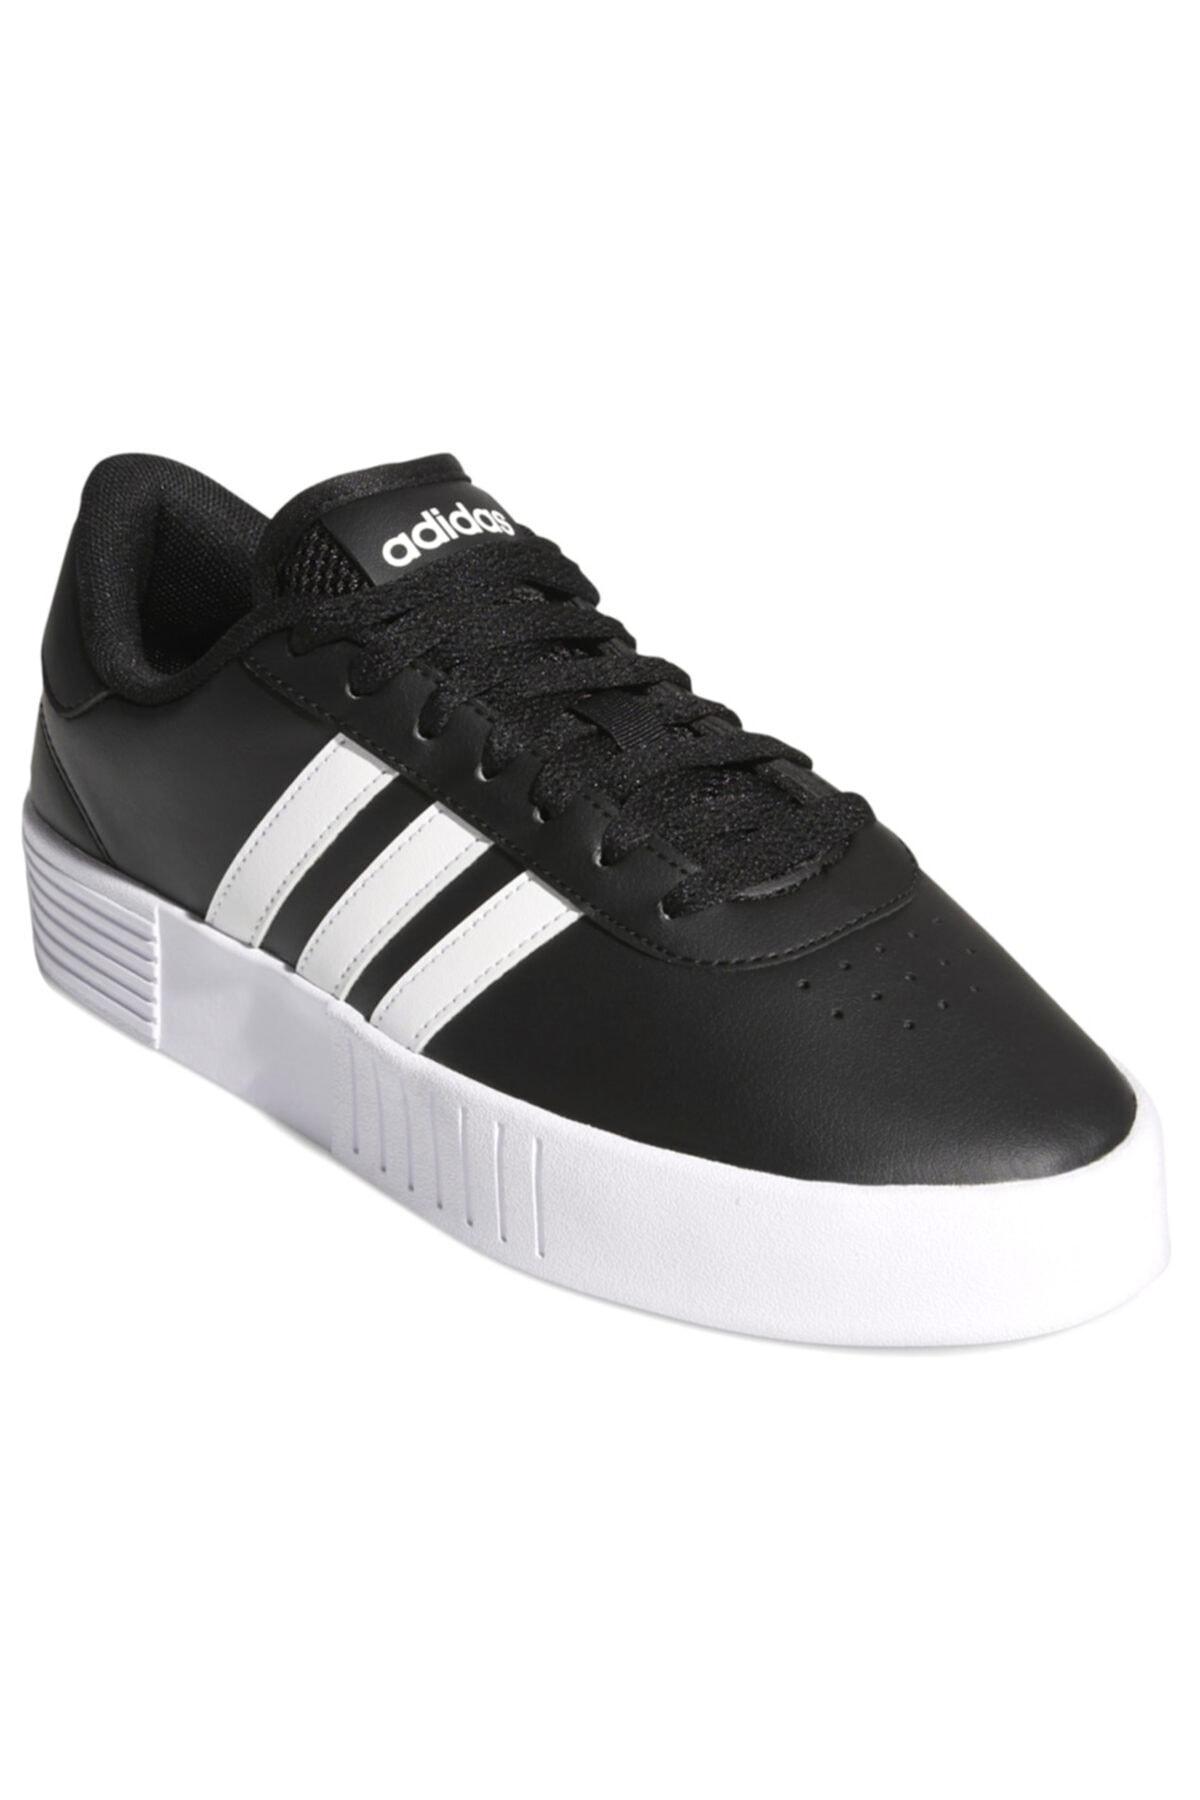 adidas COURT BOLD Siyah Kadın Sneaker Ayakkabı 100663828 2